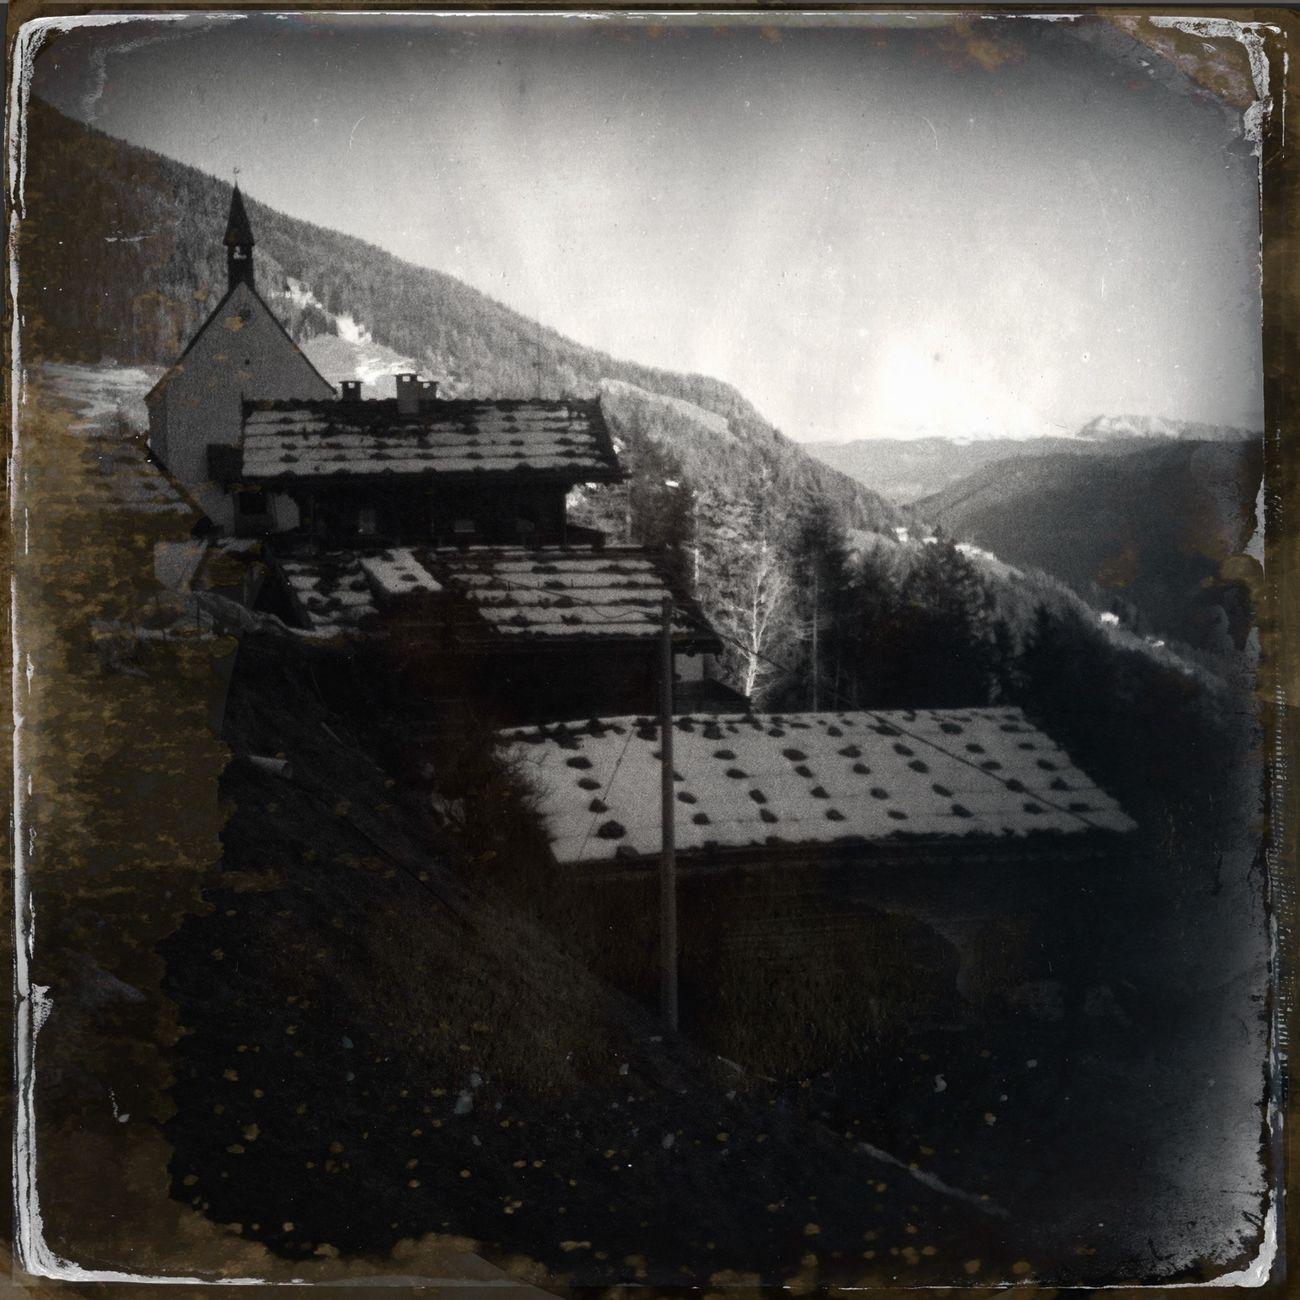 Small mountain village Blackandwhite The_guido Hipstamatic